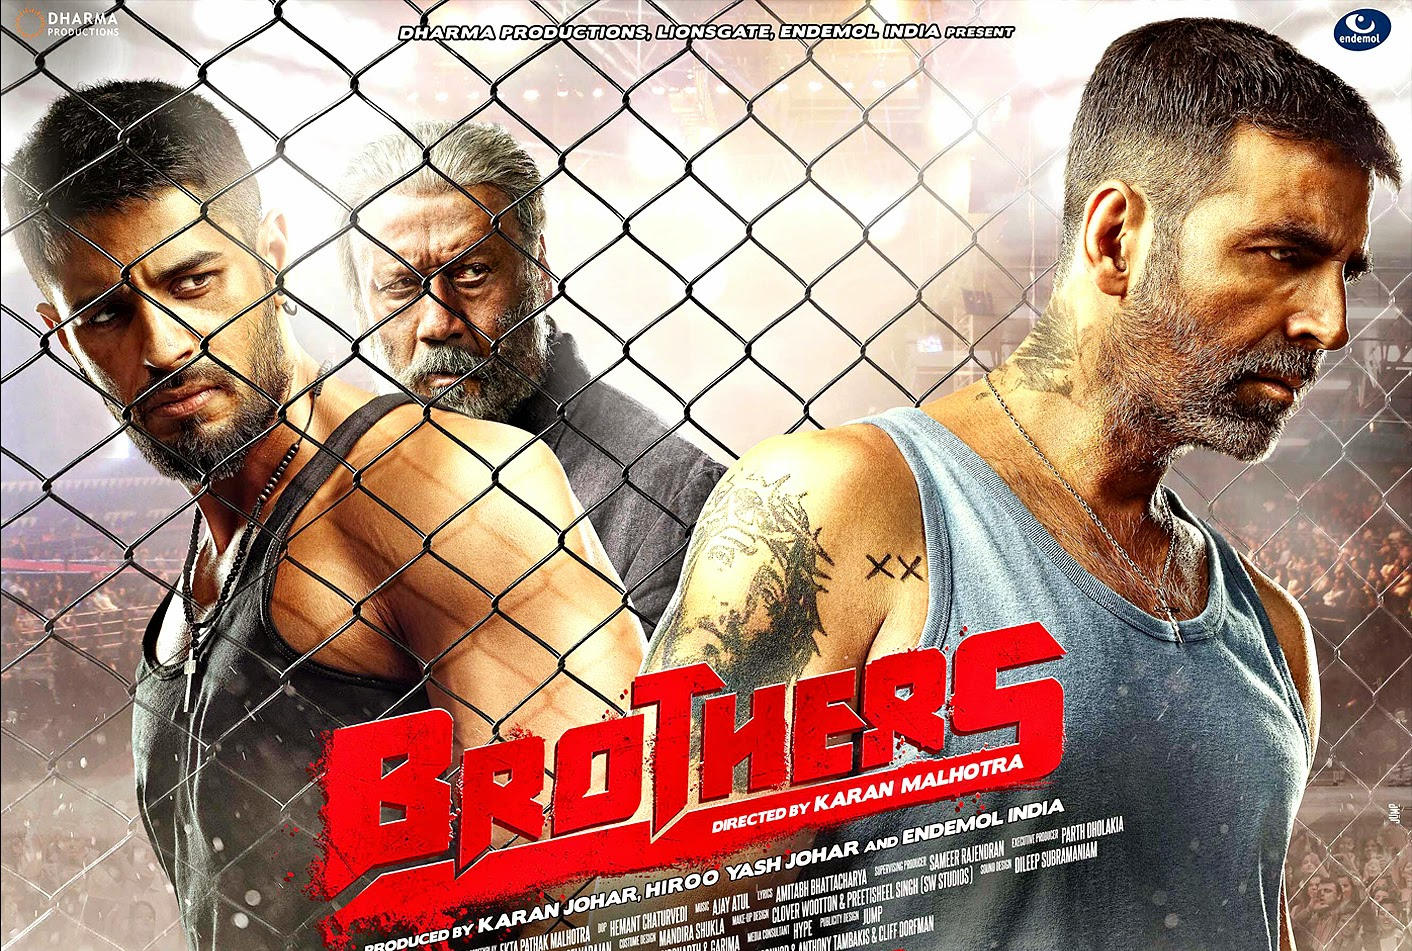 download bollywood movies full hd 1080p